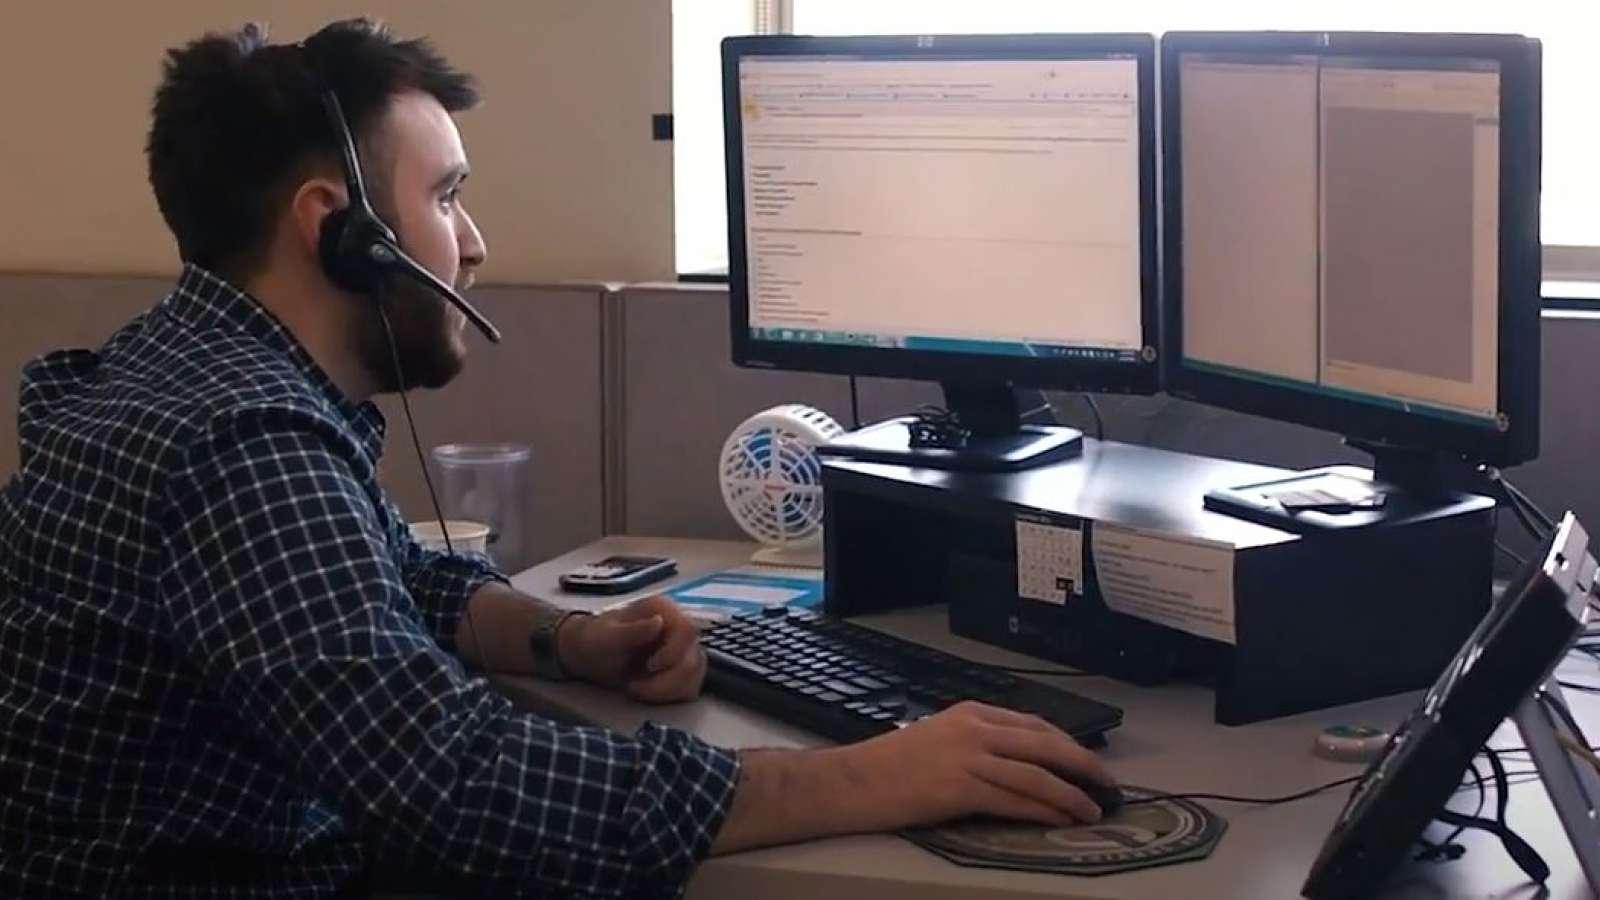 customer service representative wearing headset and talking to customer